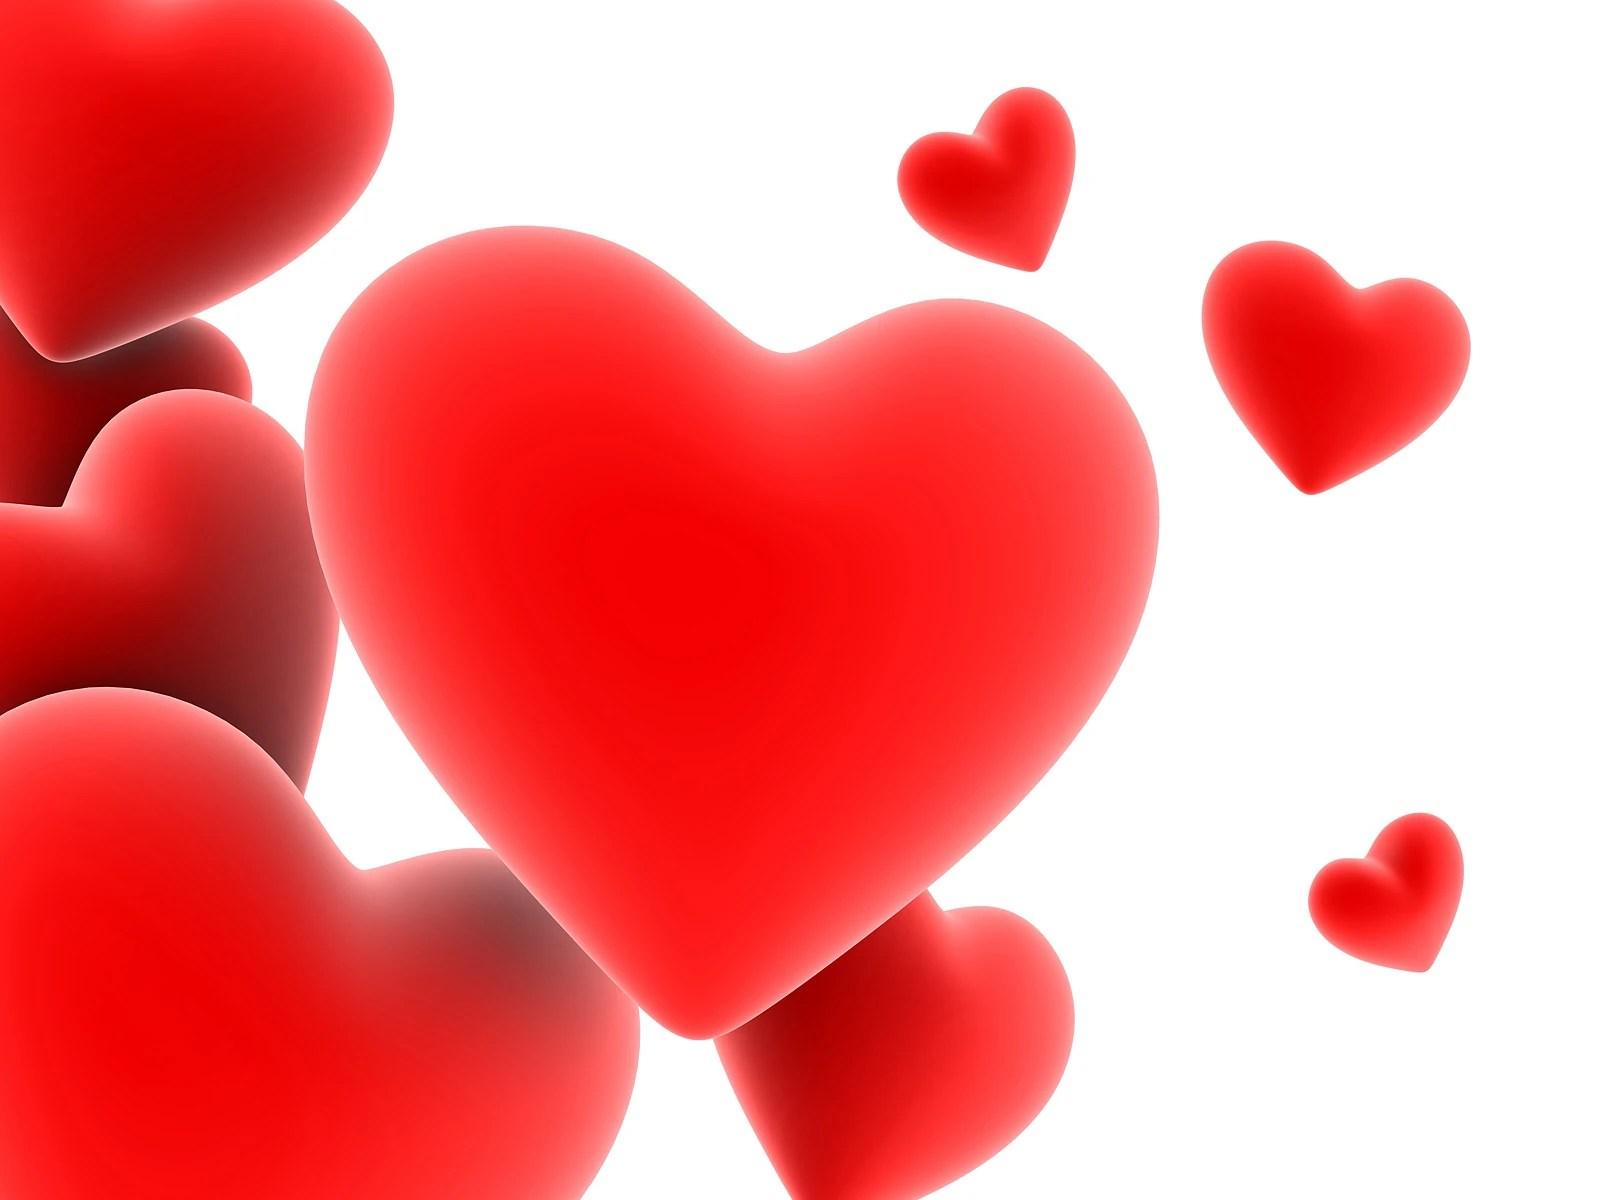 1269850209_1600x1200_floating-red-heart-wallpaper.jpg (1600×1200)